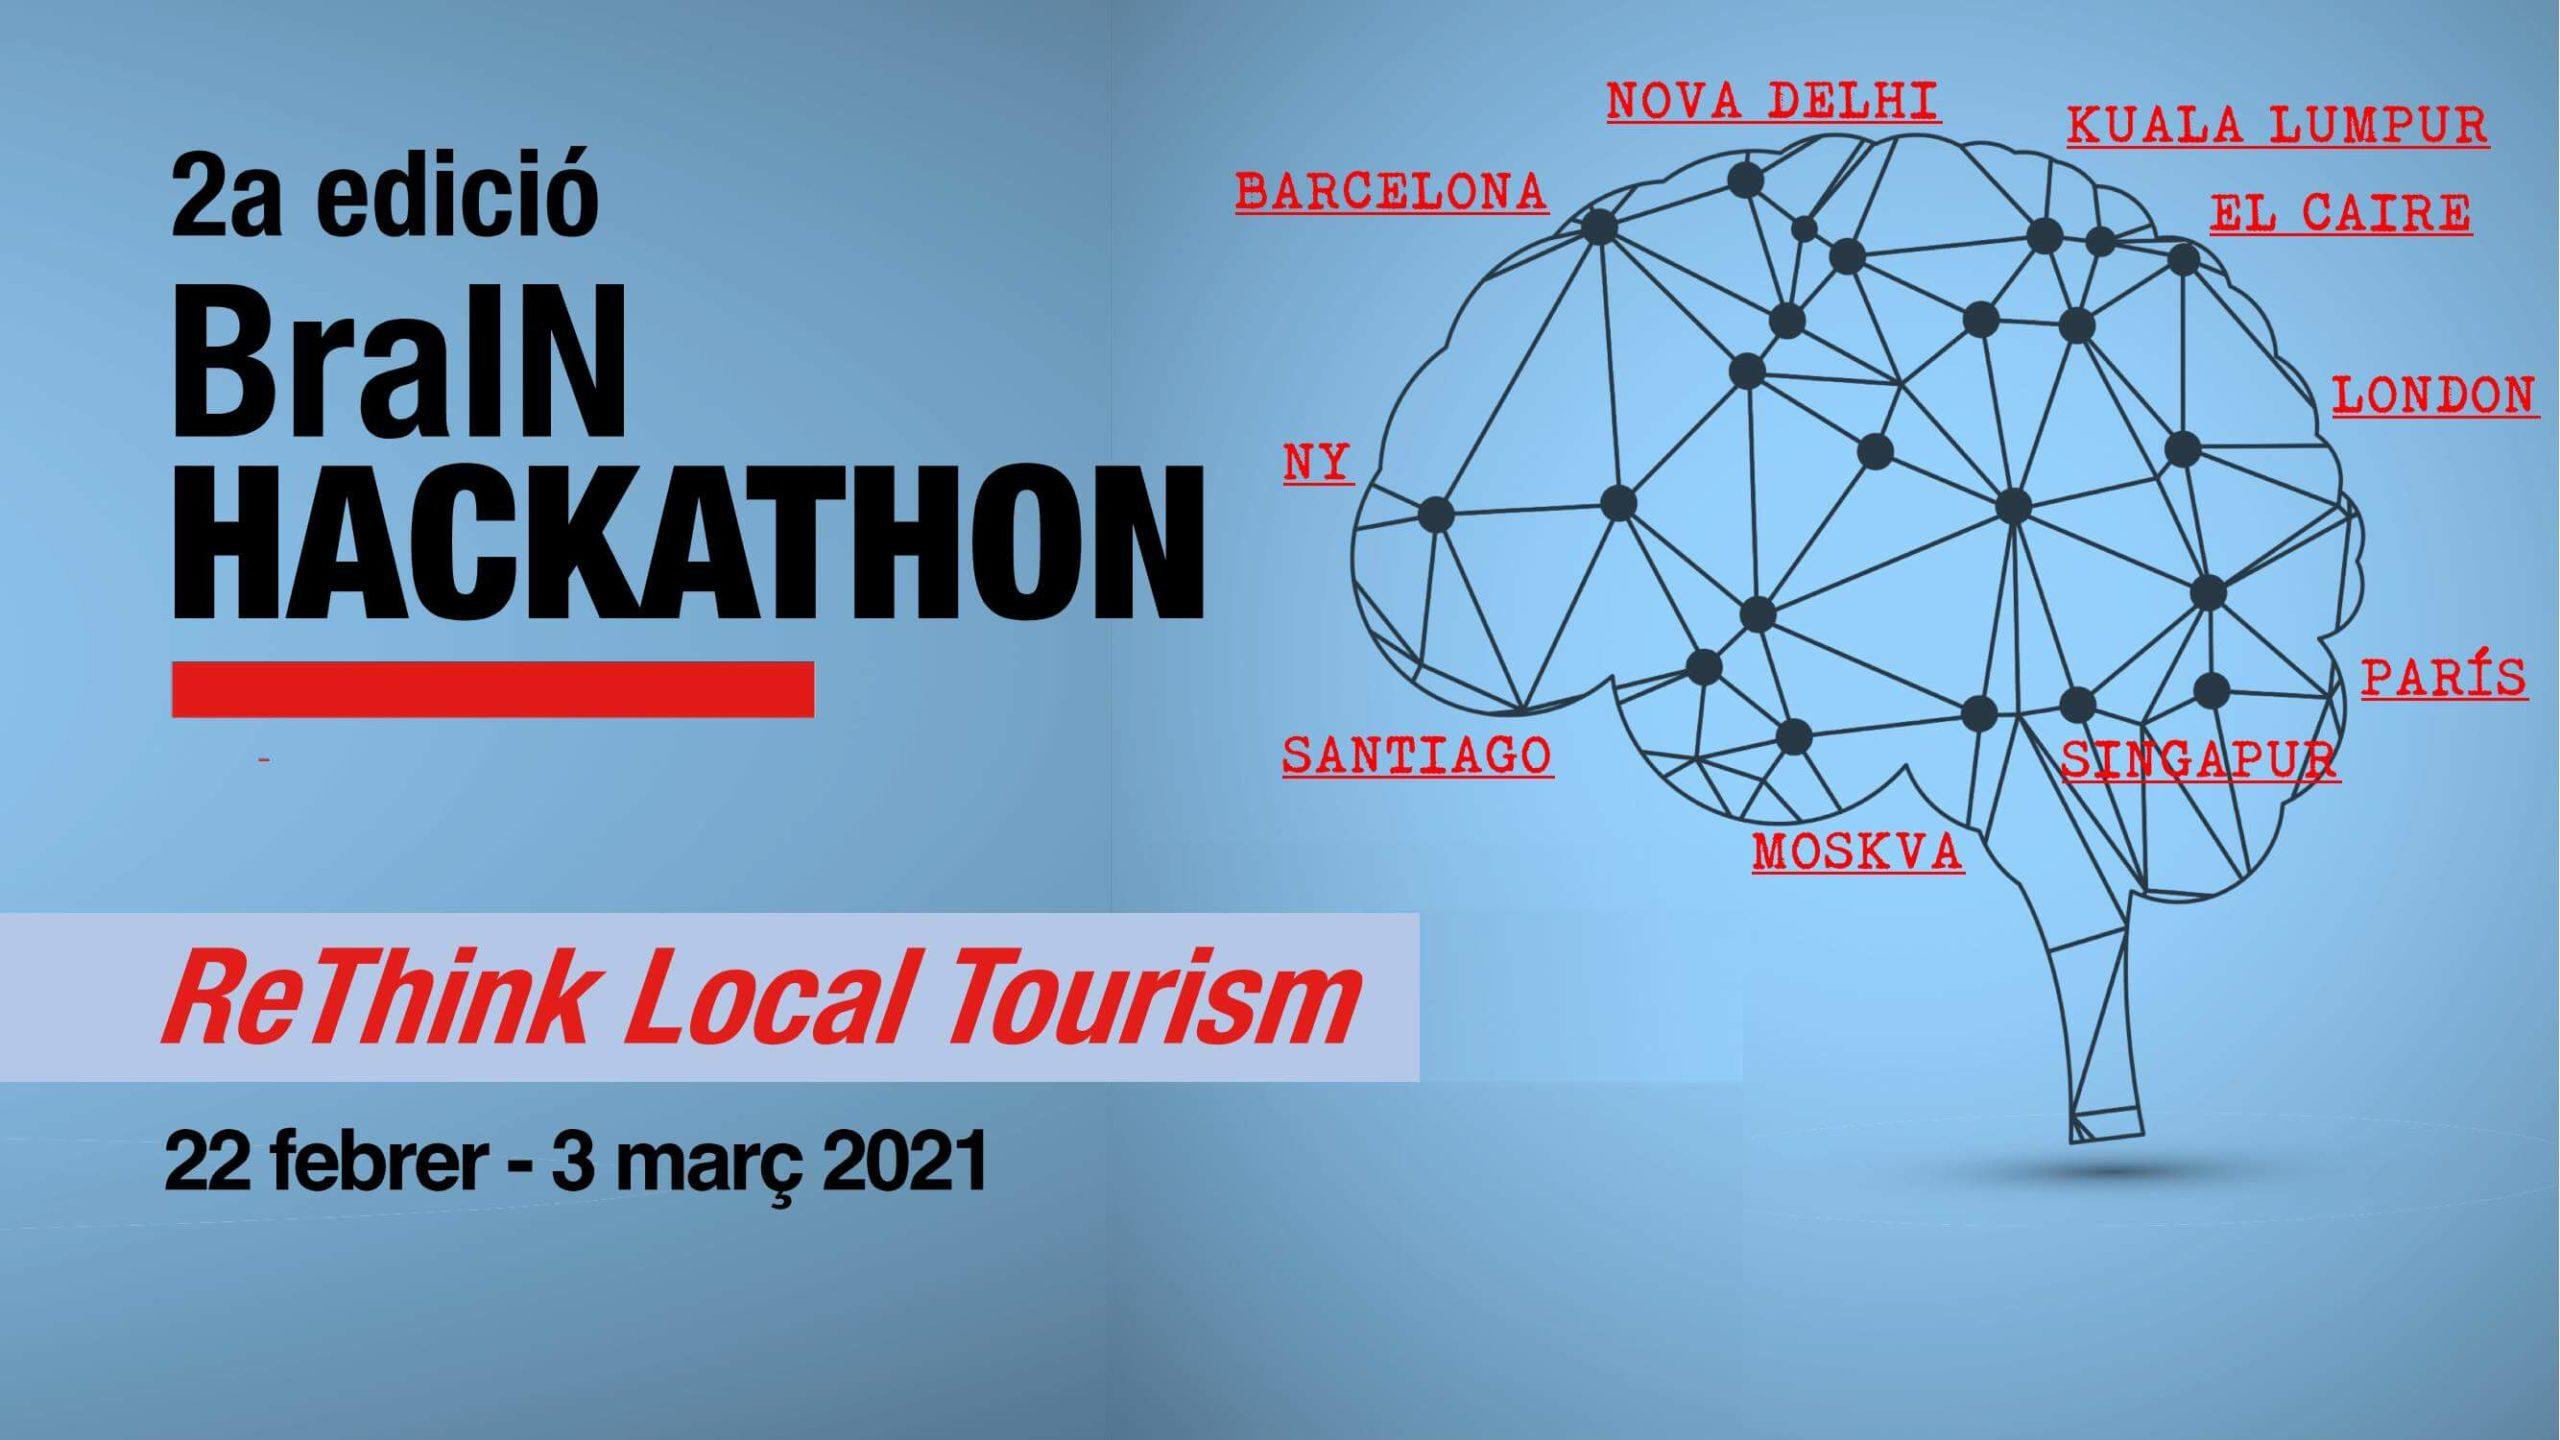 2a edició BraIN Hackathon ReThink Local Tourism